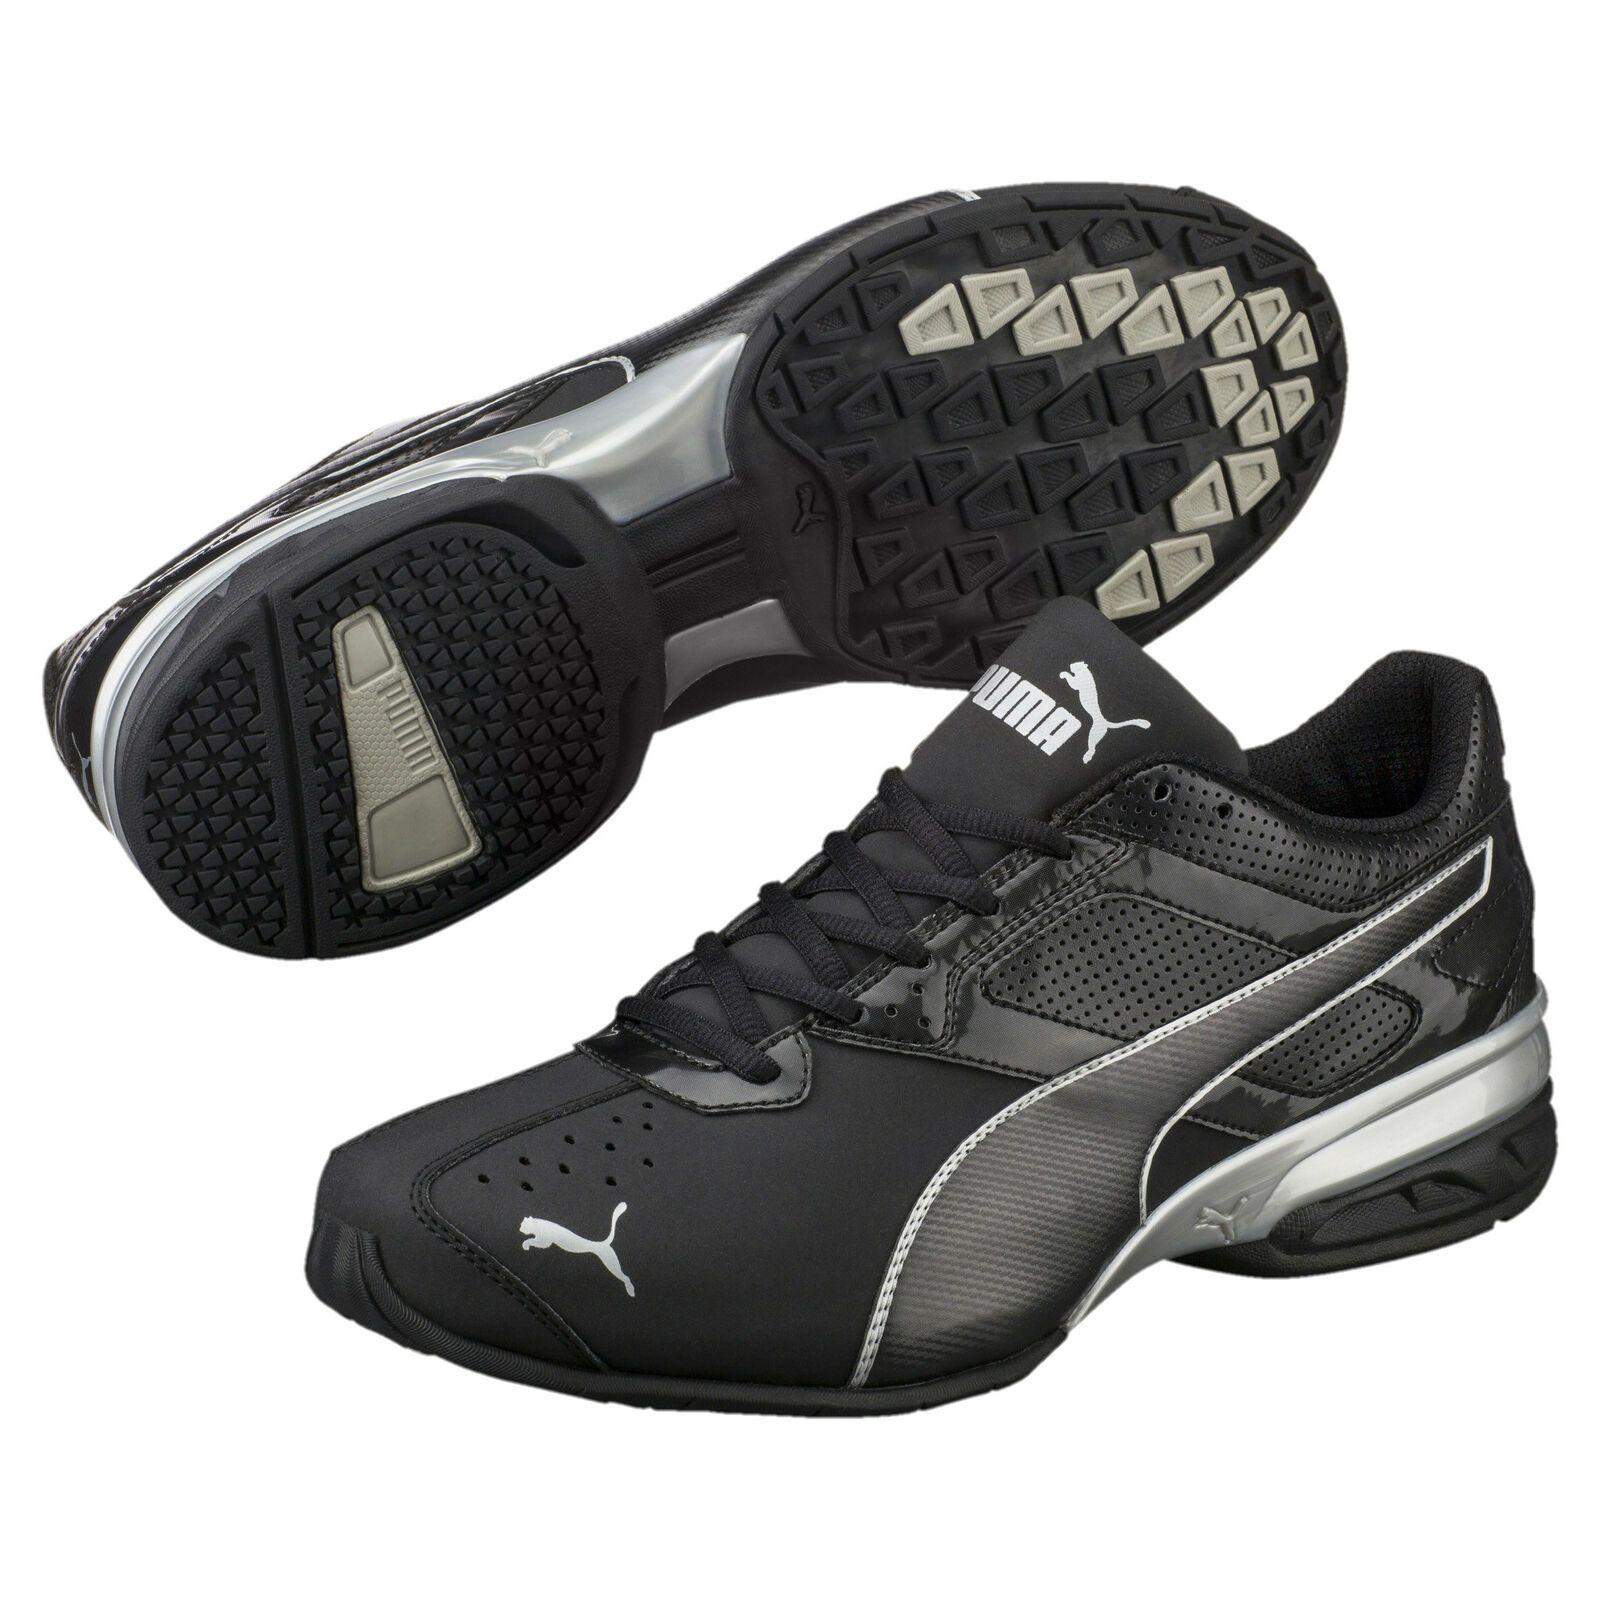 PUMA Tazon 6 FM Mens Sneakers Men Shoe